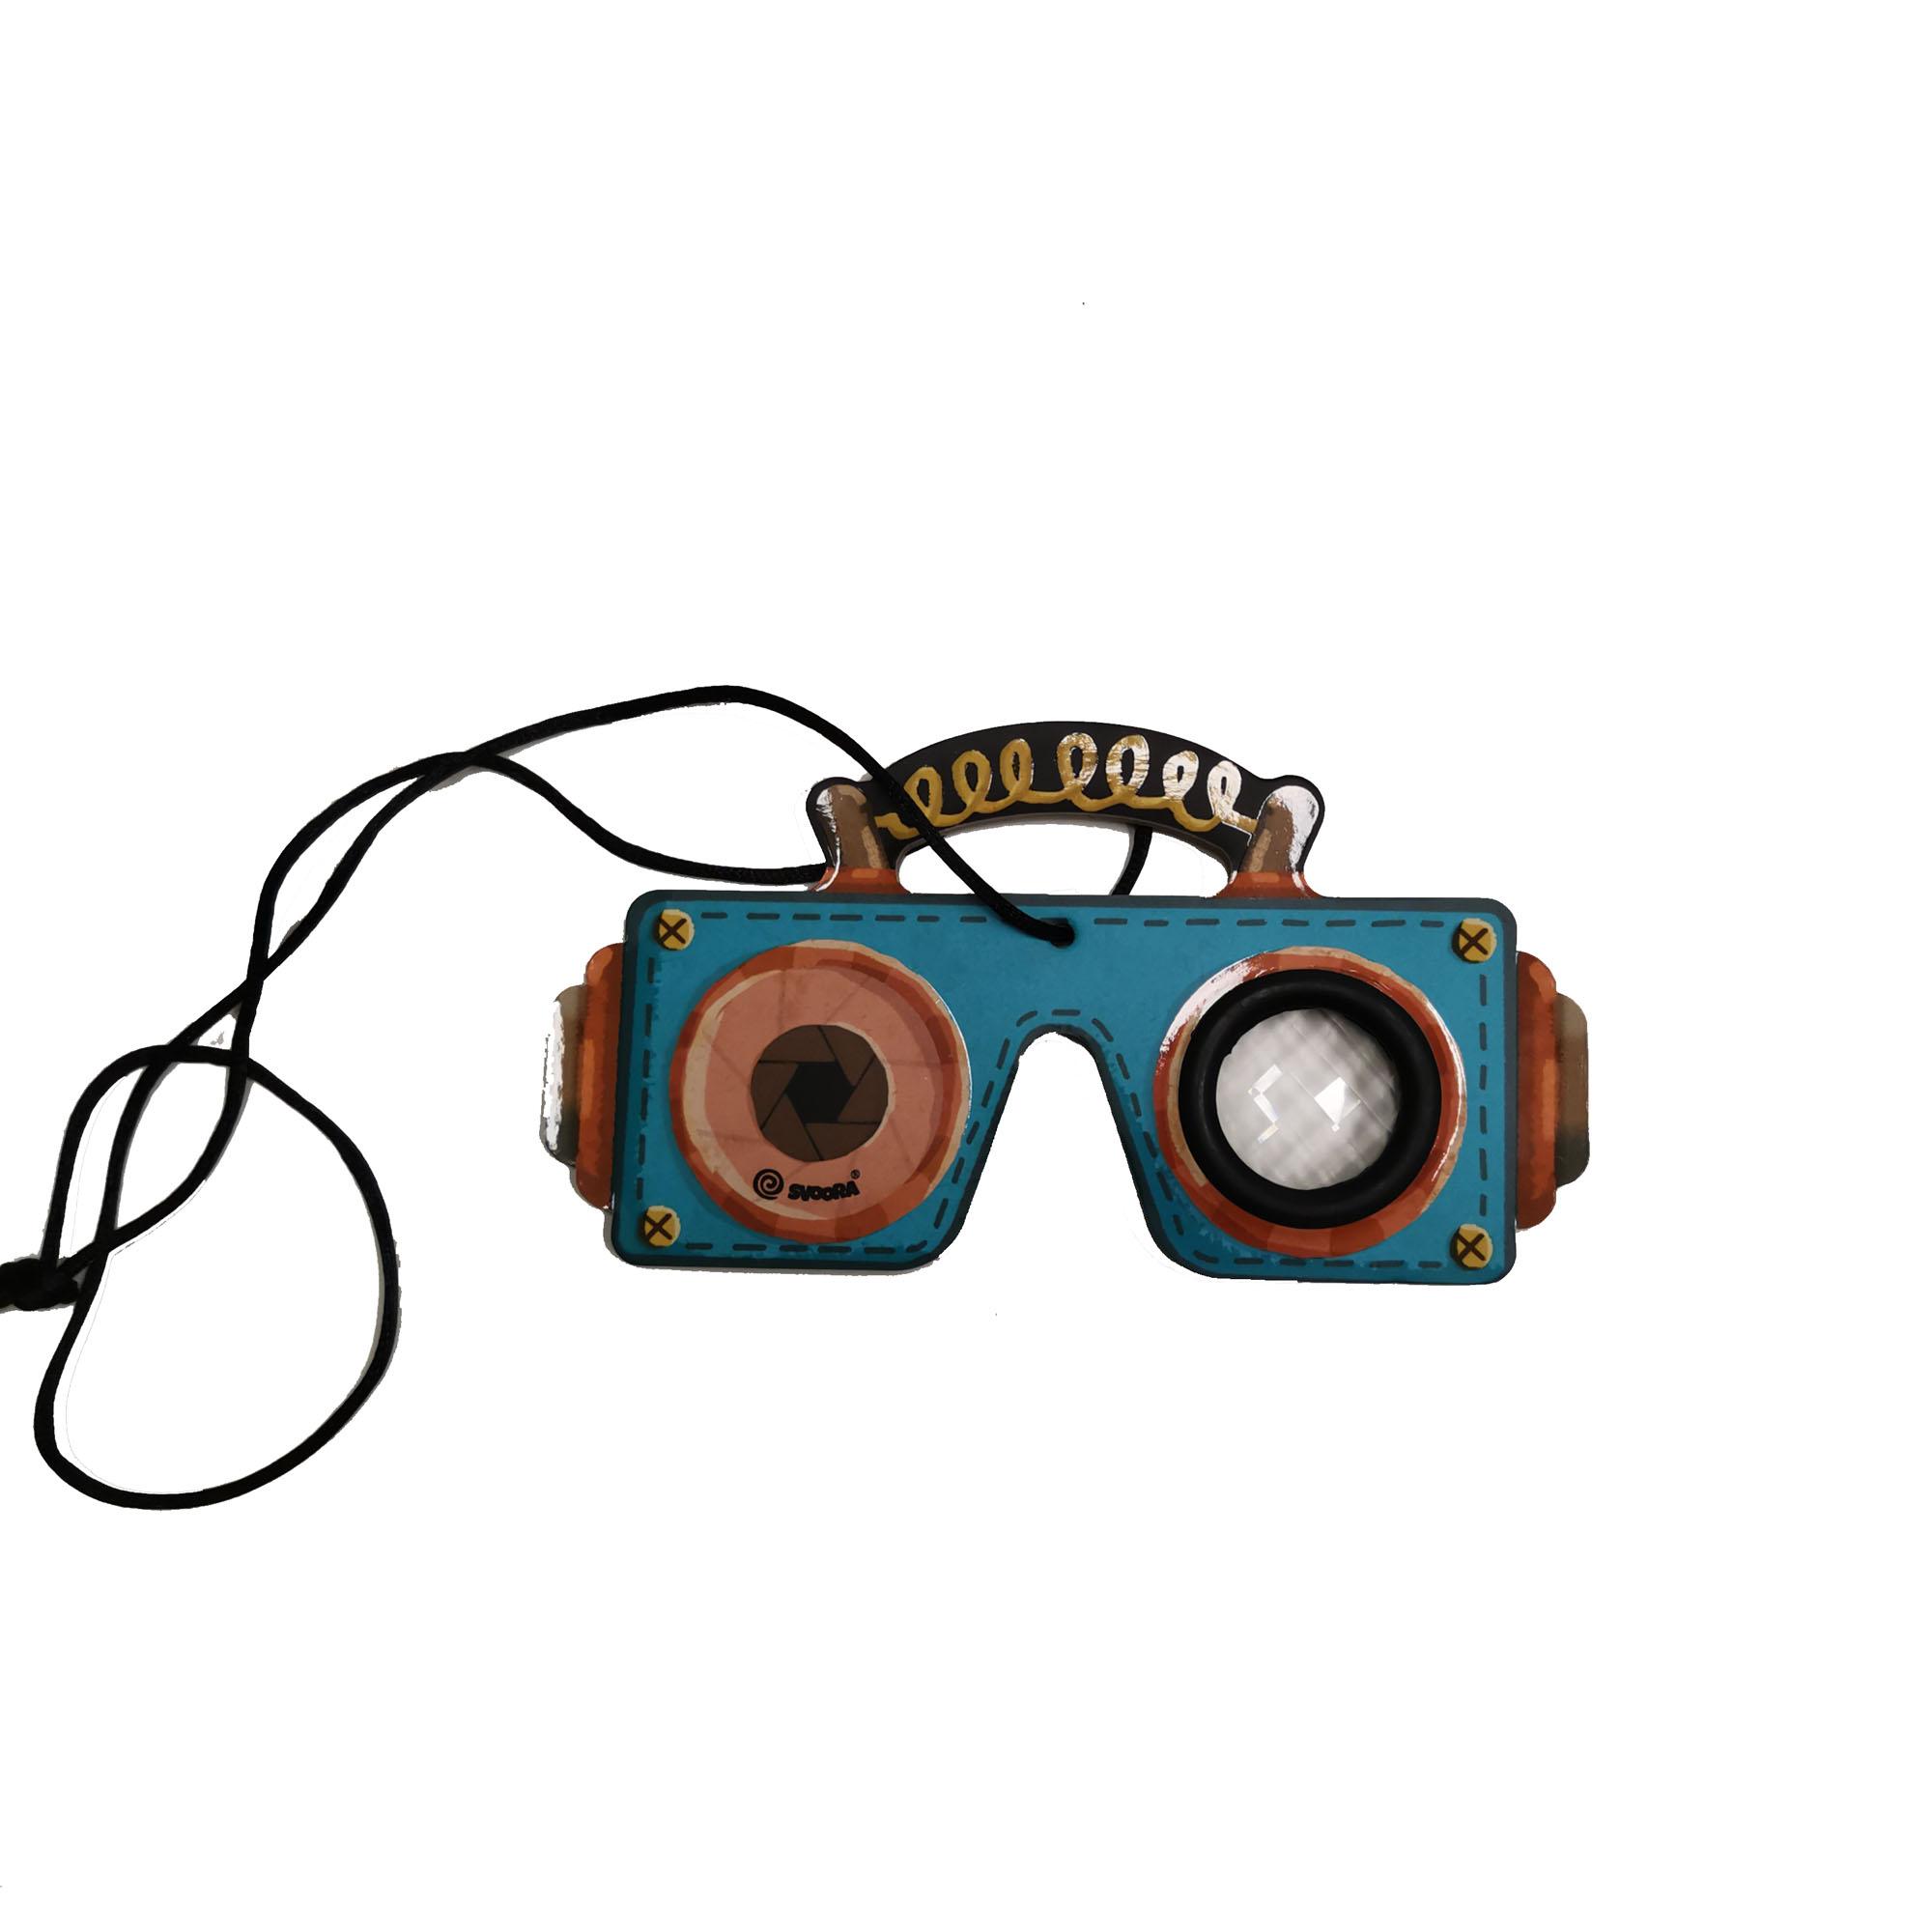 Eco friendly custom beauty rigid toy flat kaleidoscope for children